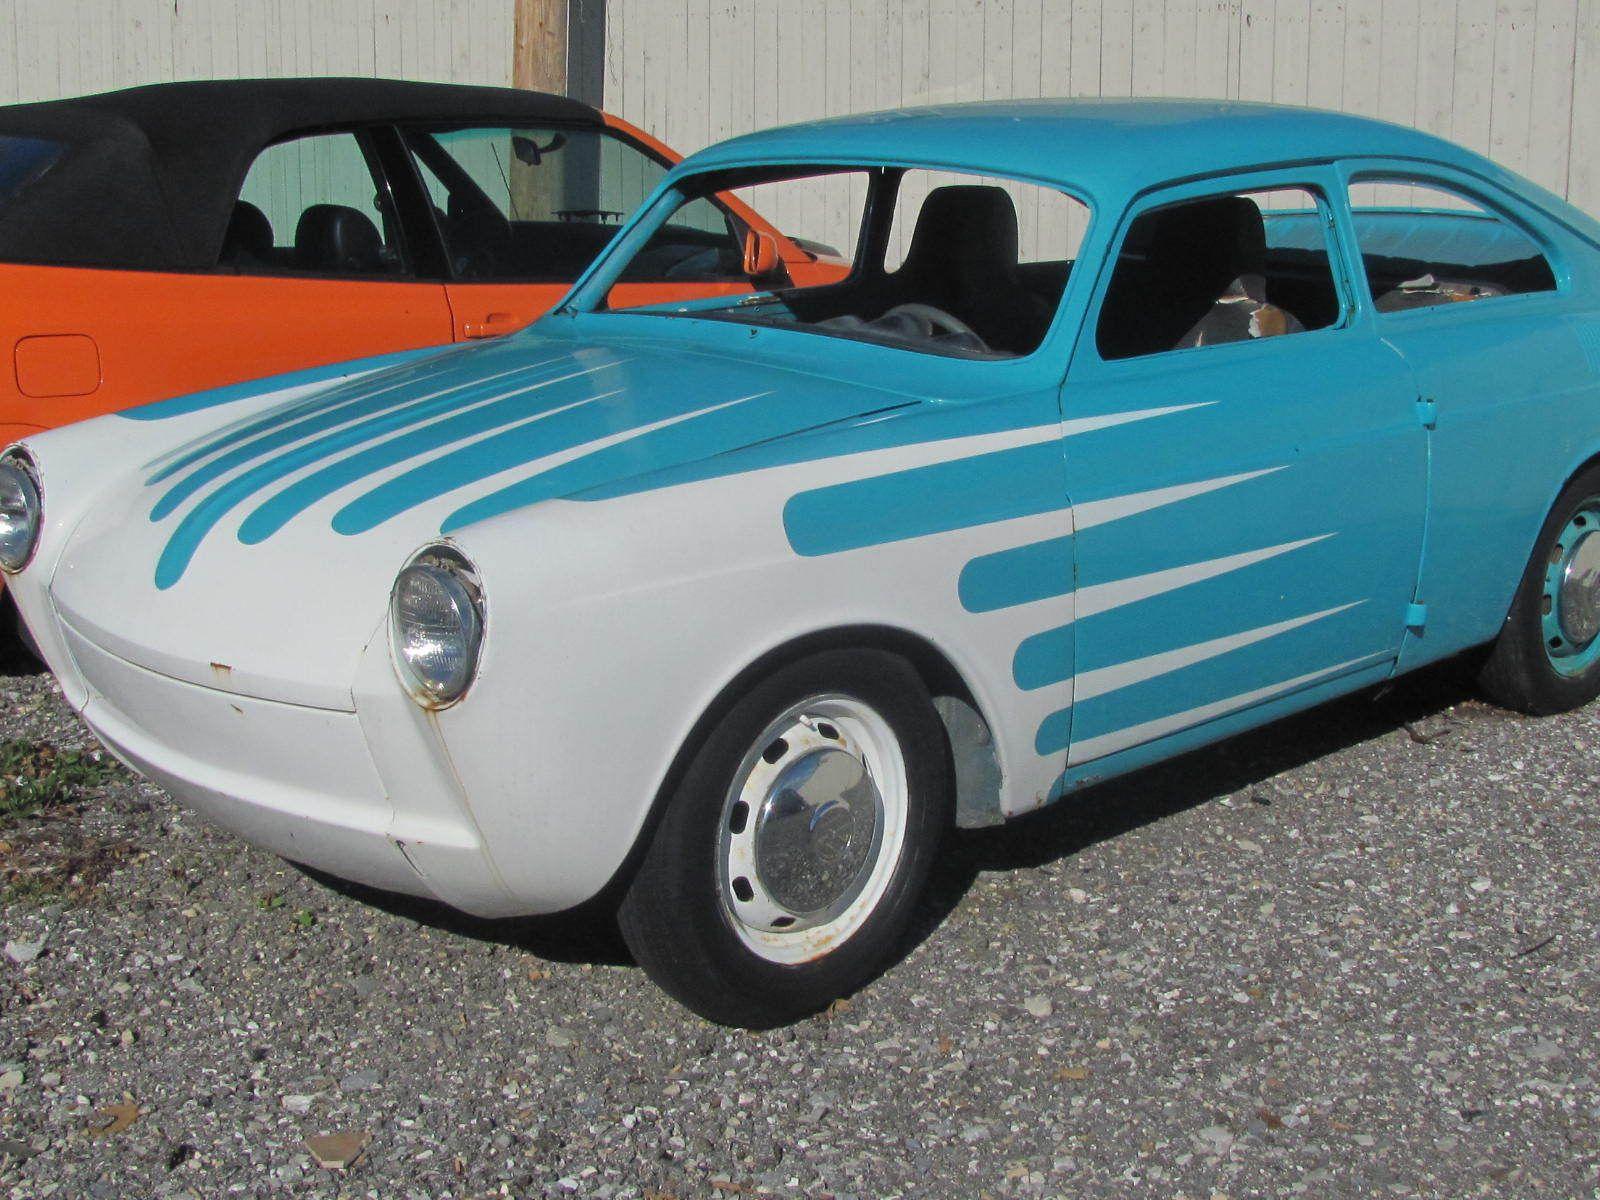 US $755.00 Used in eBay Motors, Cars & Trucks, Volkswagen   V-dubs ...